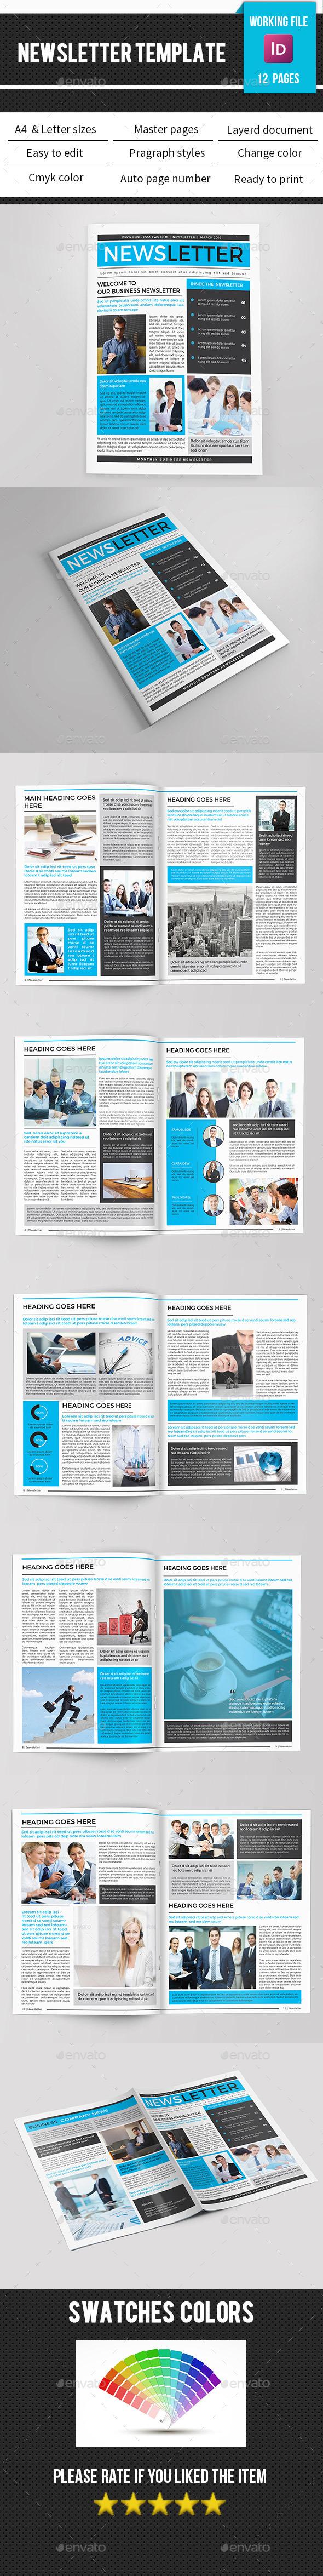 Corporate Newsletter-V10 - Newsletters Print Templates